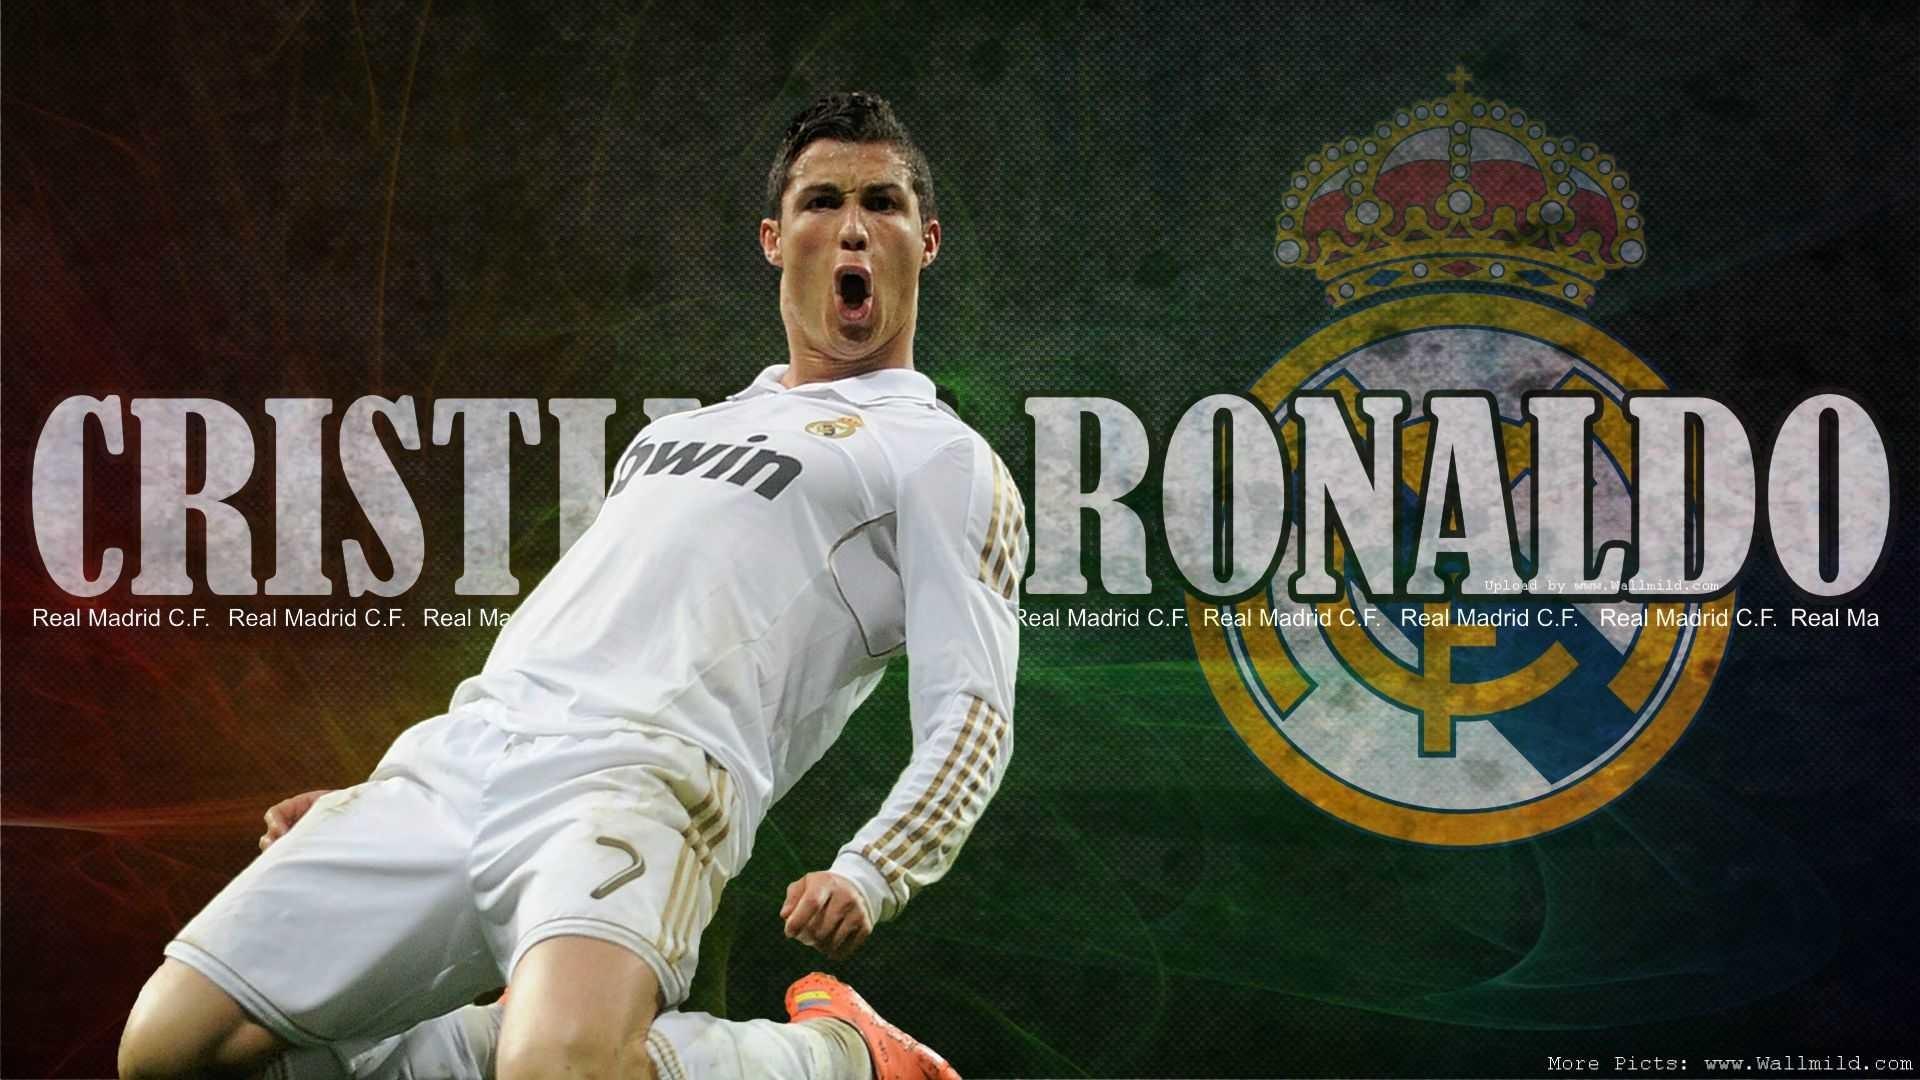 Cr7 Hd Wallpapers 1080p Cristiano Ronaldo 7 Wallpaper 2018 69 Images